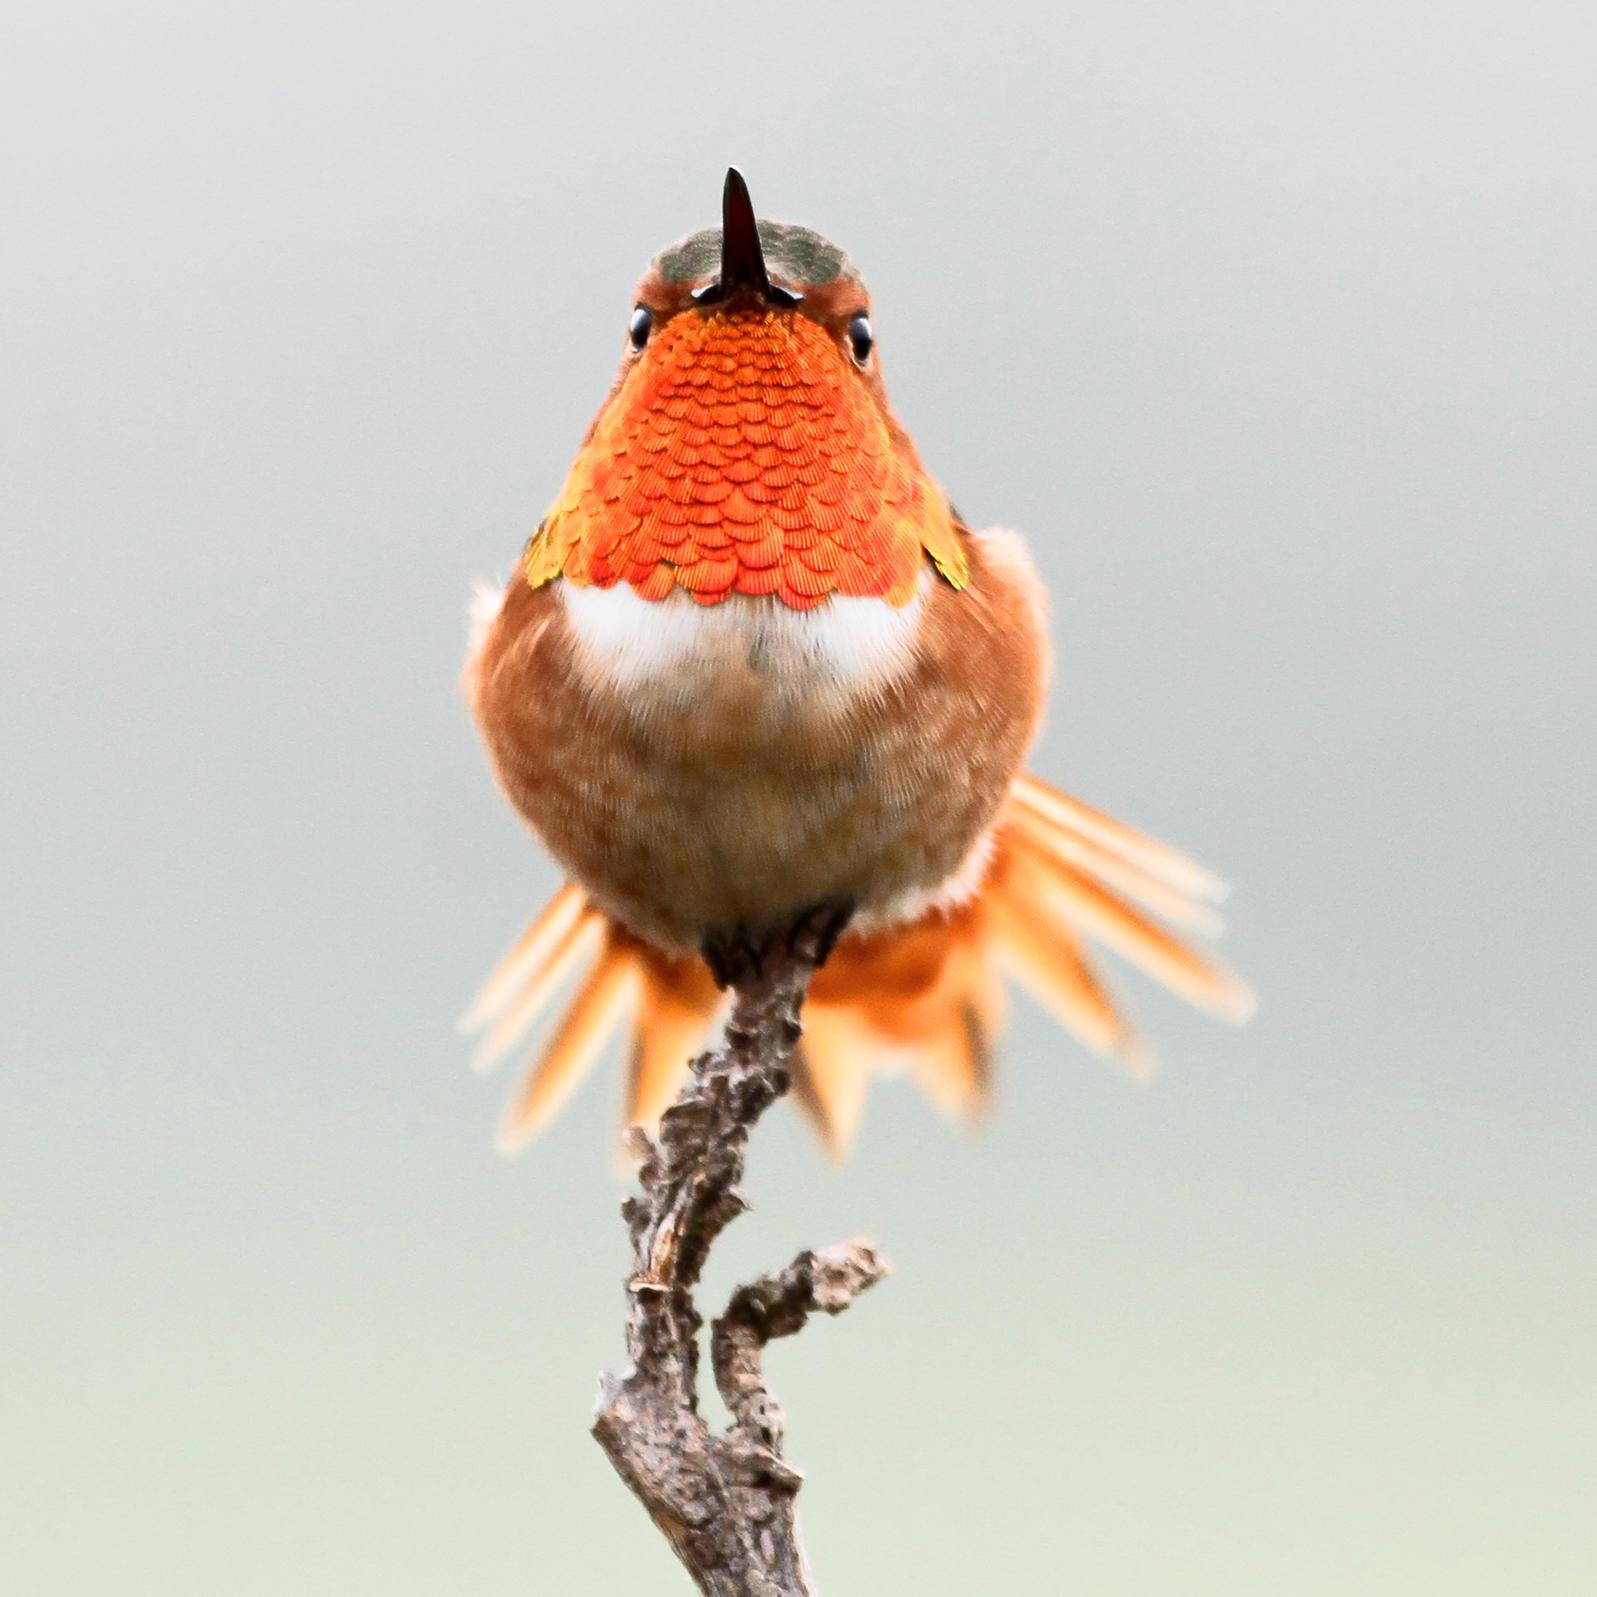 Allen's Hummingbird. Alexander Viduetsky/Audubon Photography Awards